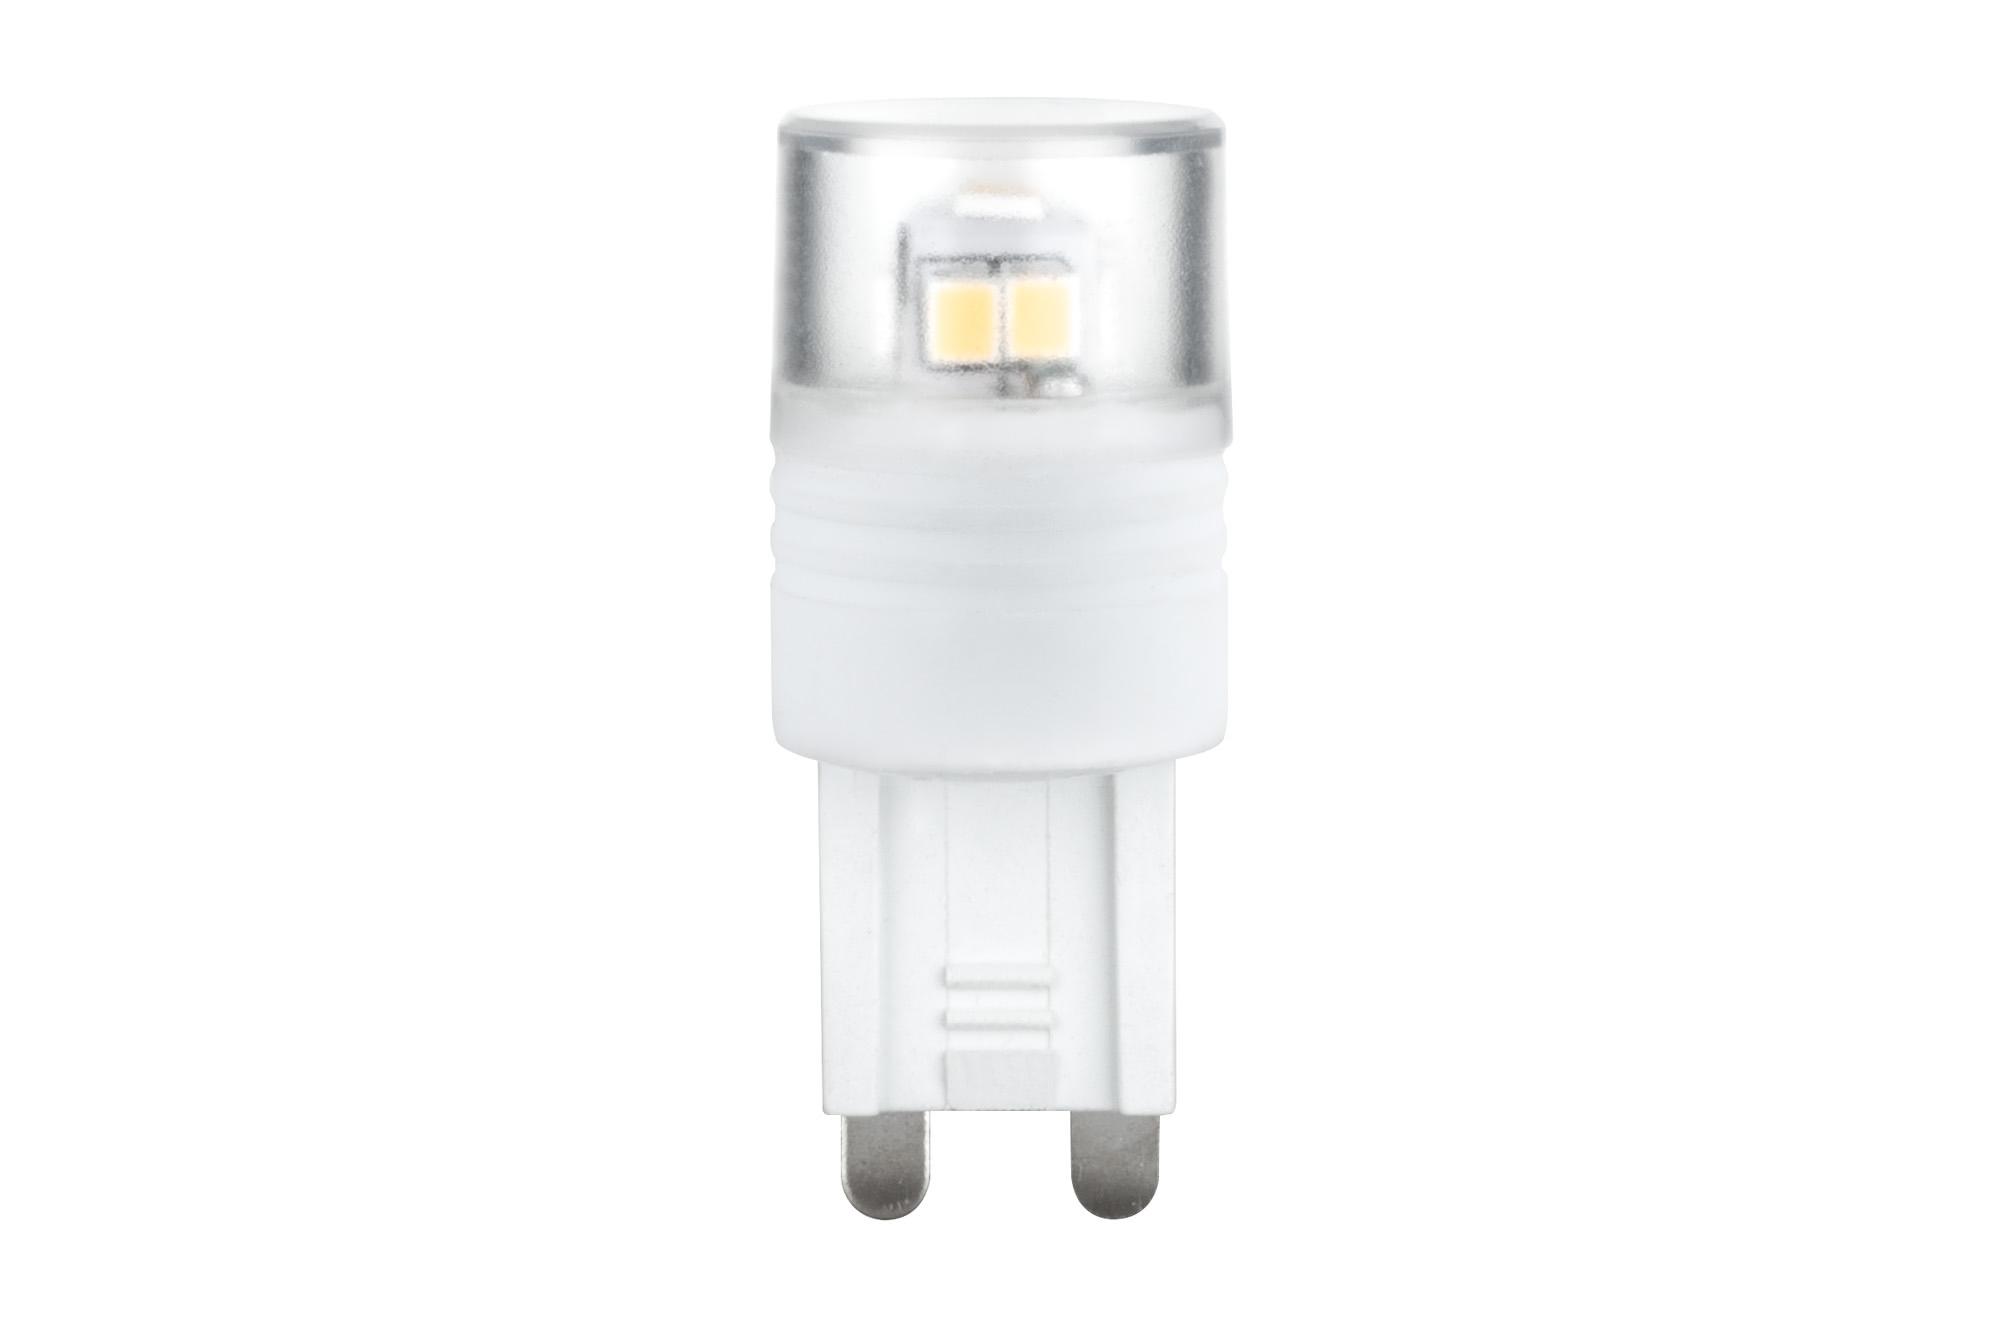 Paulmann. 28179 LED Quality Stiftsockel 1,5W G9 Warmwei?